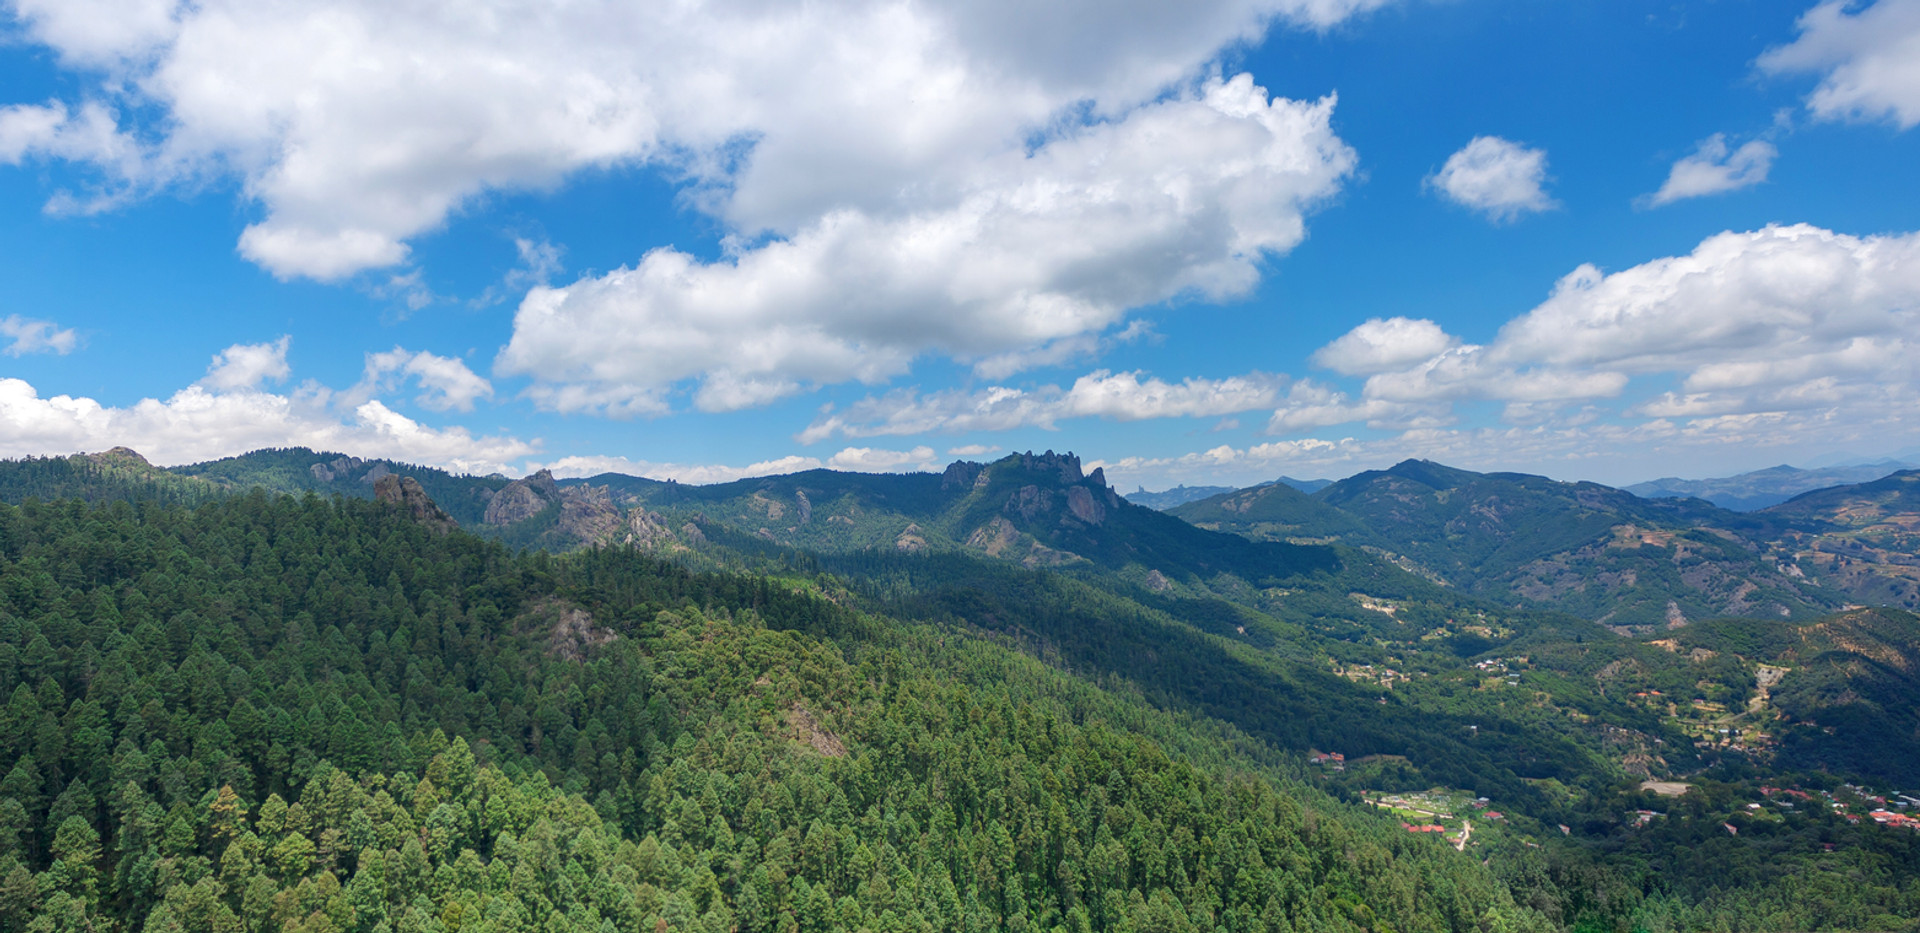 mountains-3629491.jpg